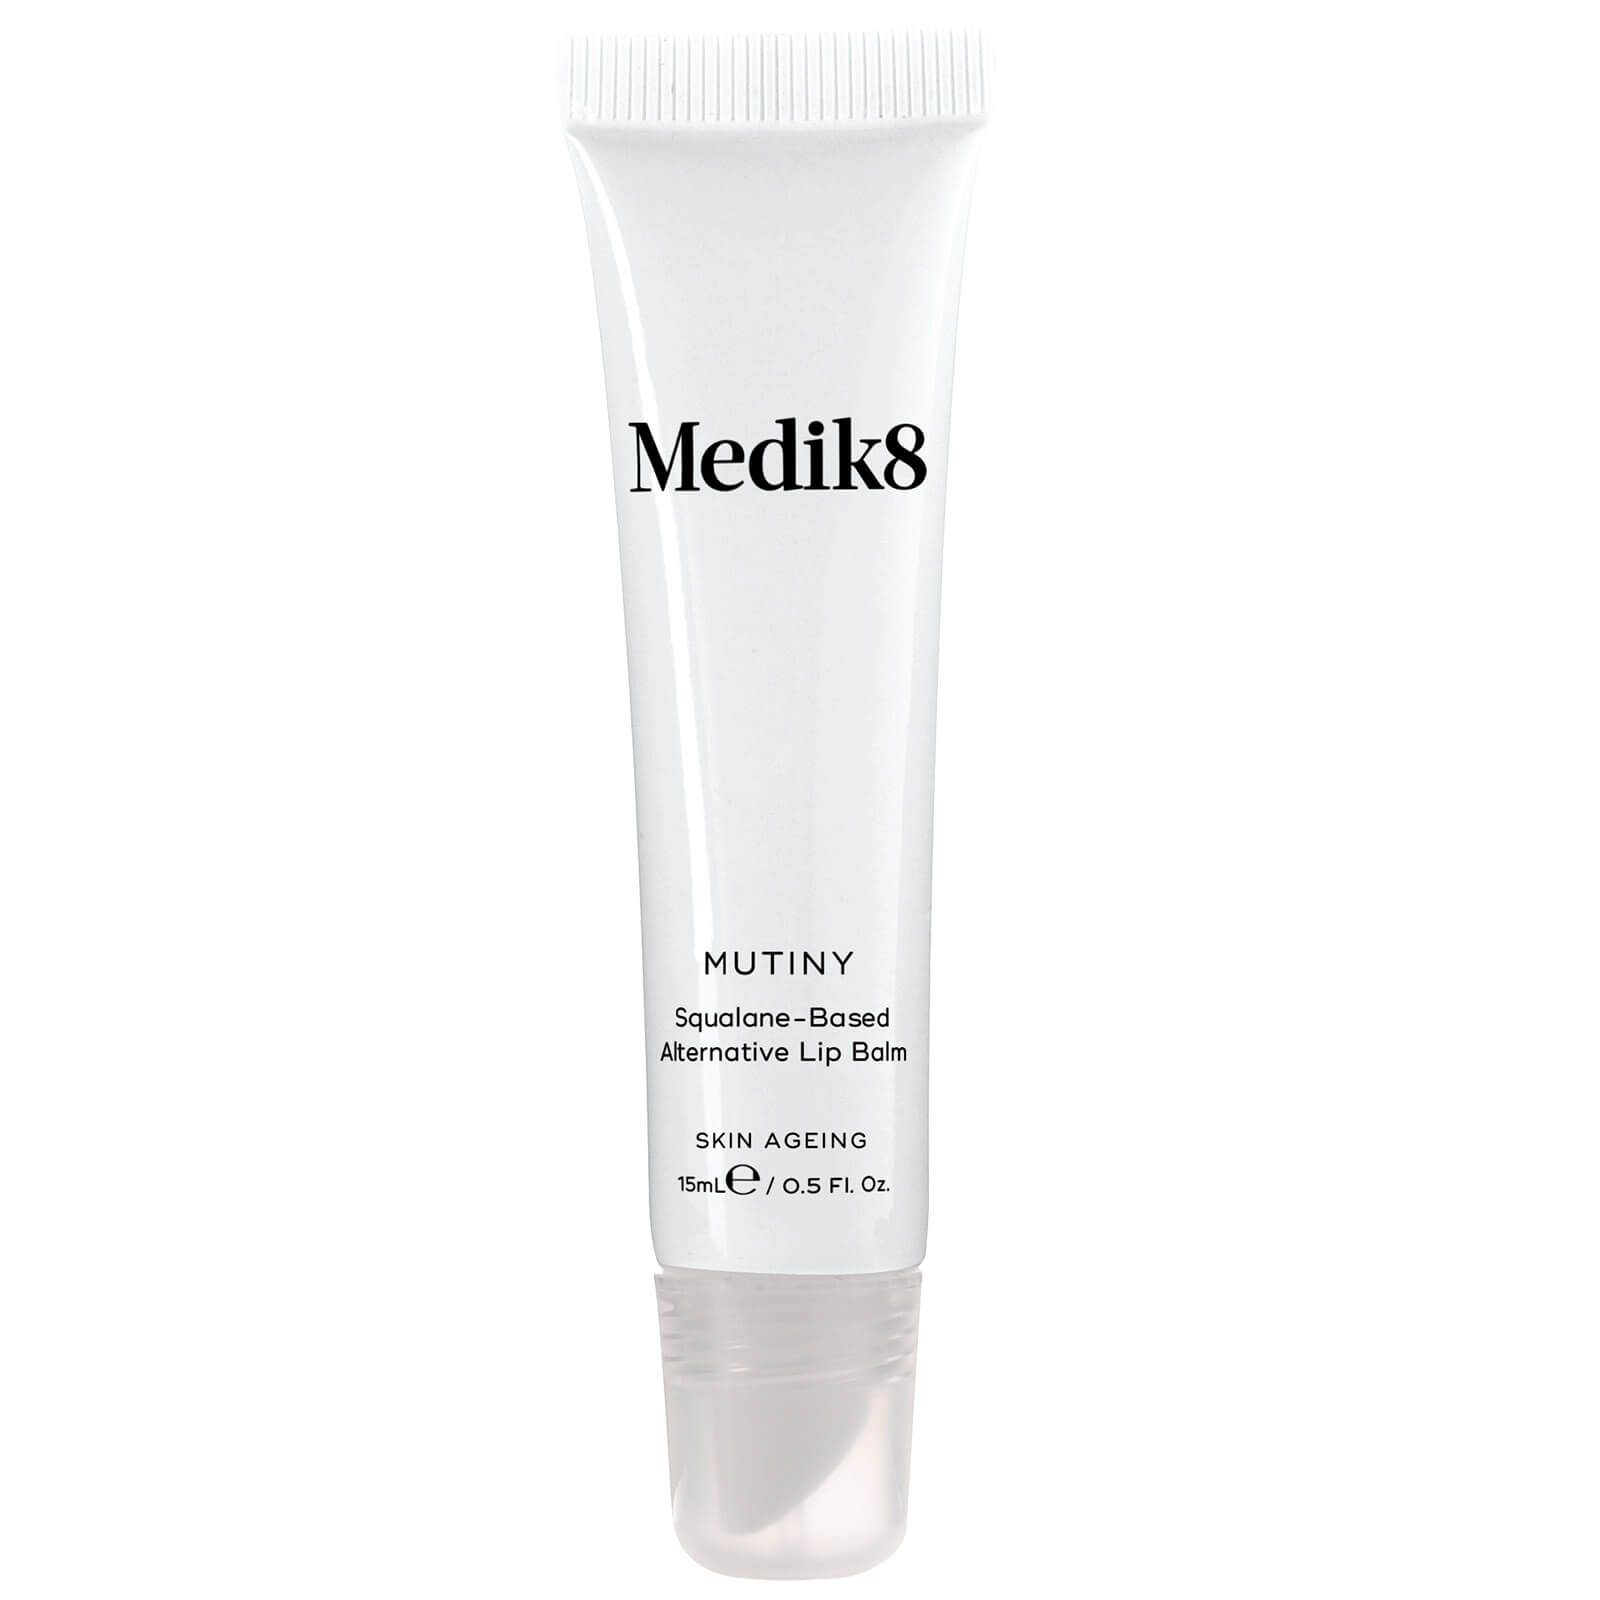 Medik8 Mutiny Lip Balm (15ml)